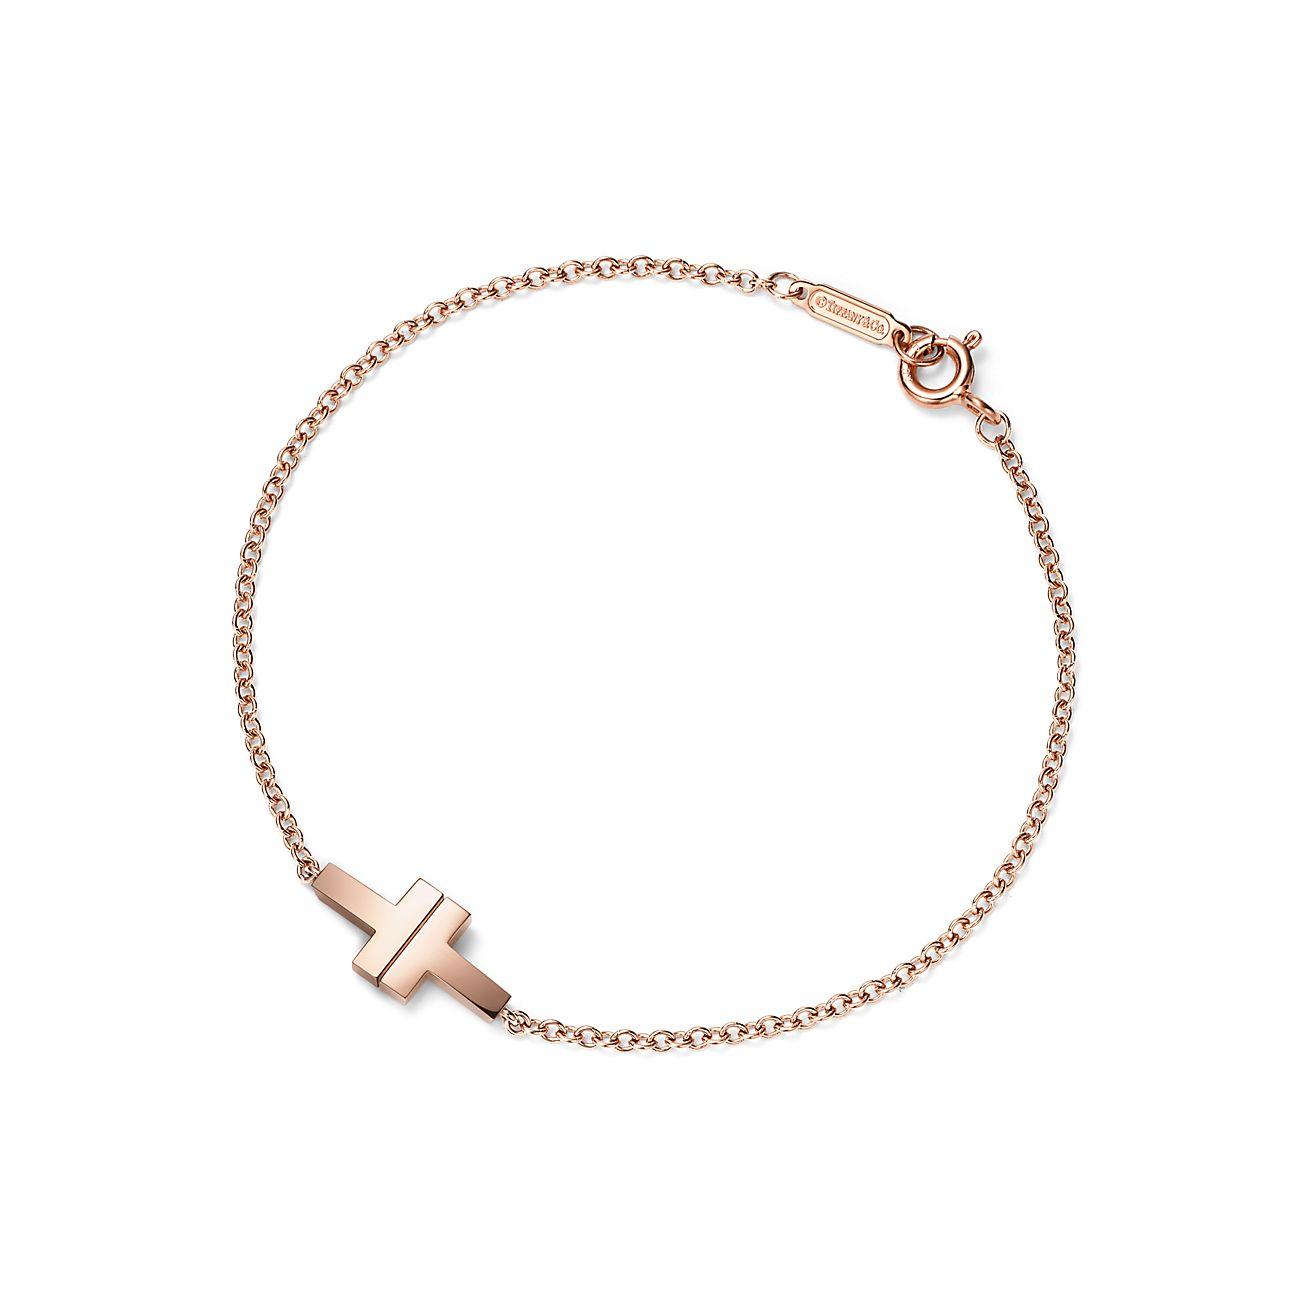 Bracelet chaîne simple Tiffany T Two en or rose 18 carats. Medium ... 46224dffac8d